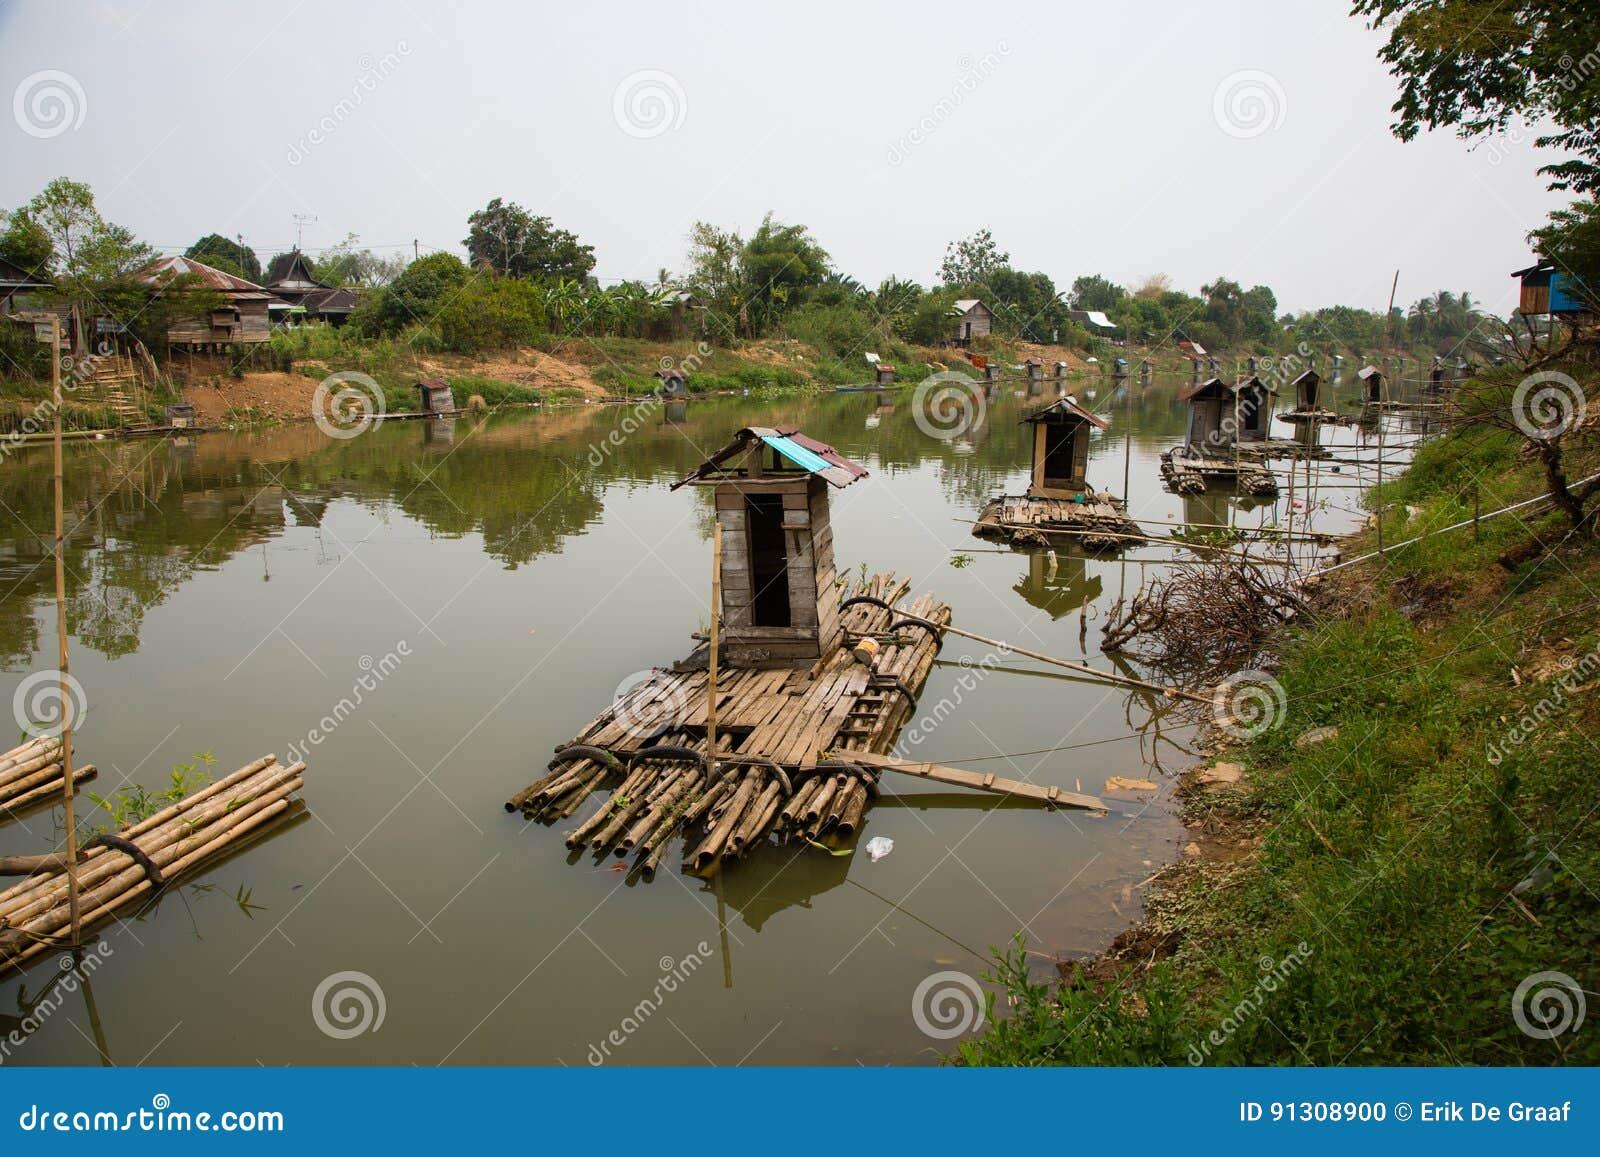 Kampong bathrooms